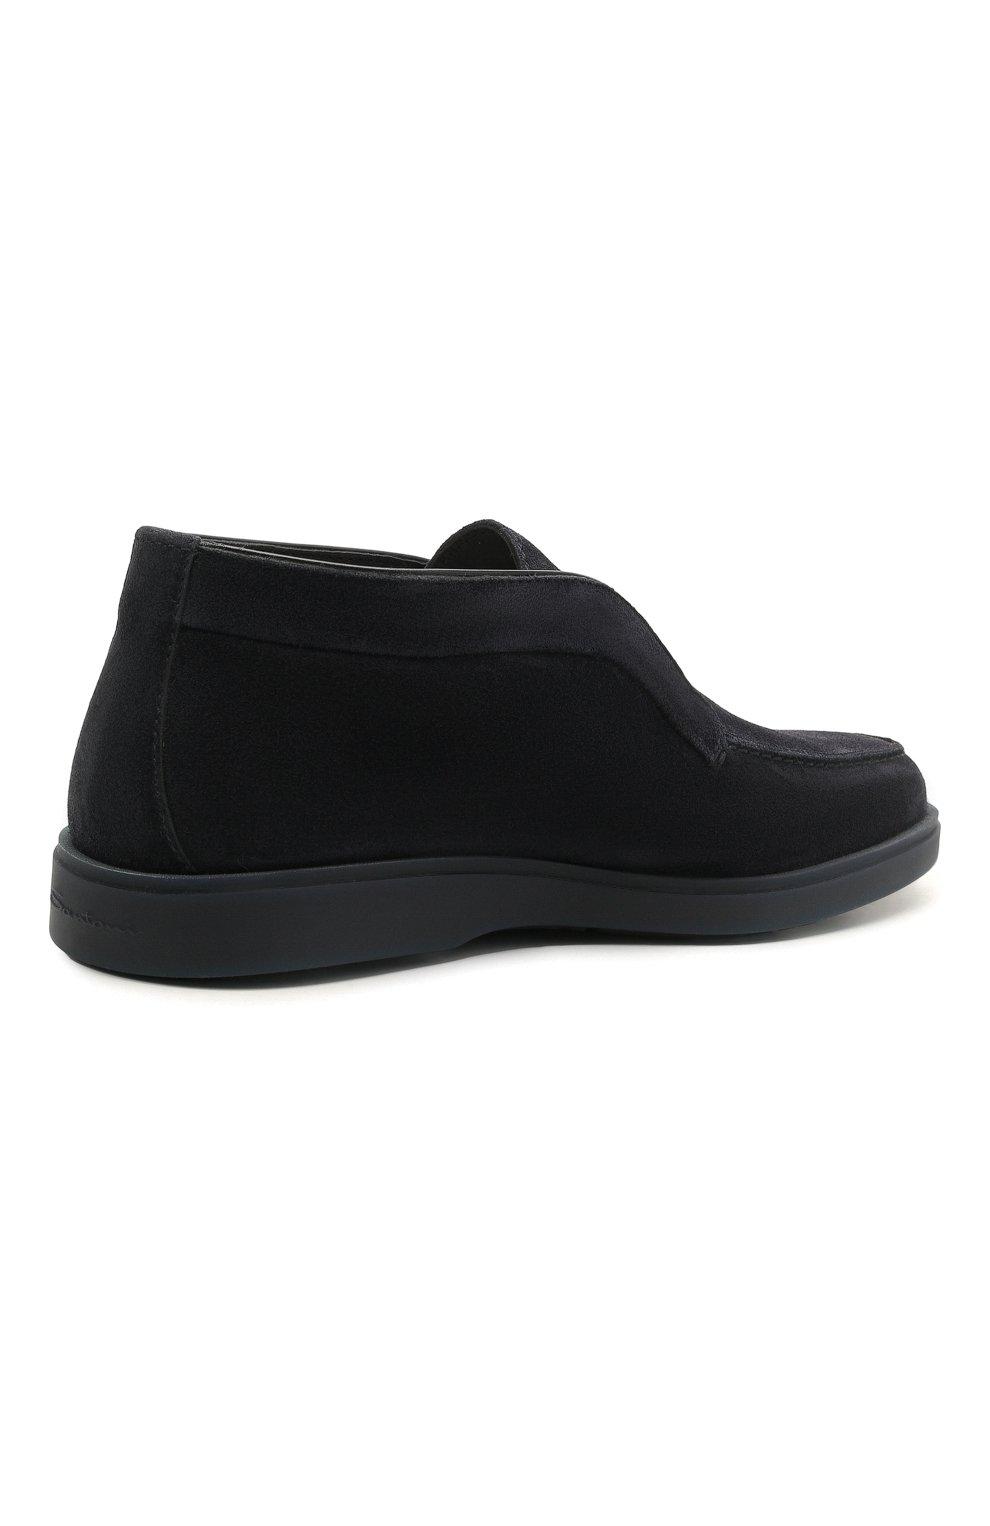 Мужские замшевые ботинки SANTONI темно-синего цвета, арт. MGDT1782300TASVUU60   Фото 4 (Мужское Кросс-КТ: Ботинки-обувь, зимние ботинки; Подошва: Плоская)